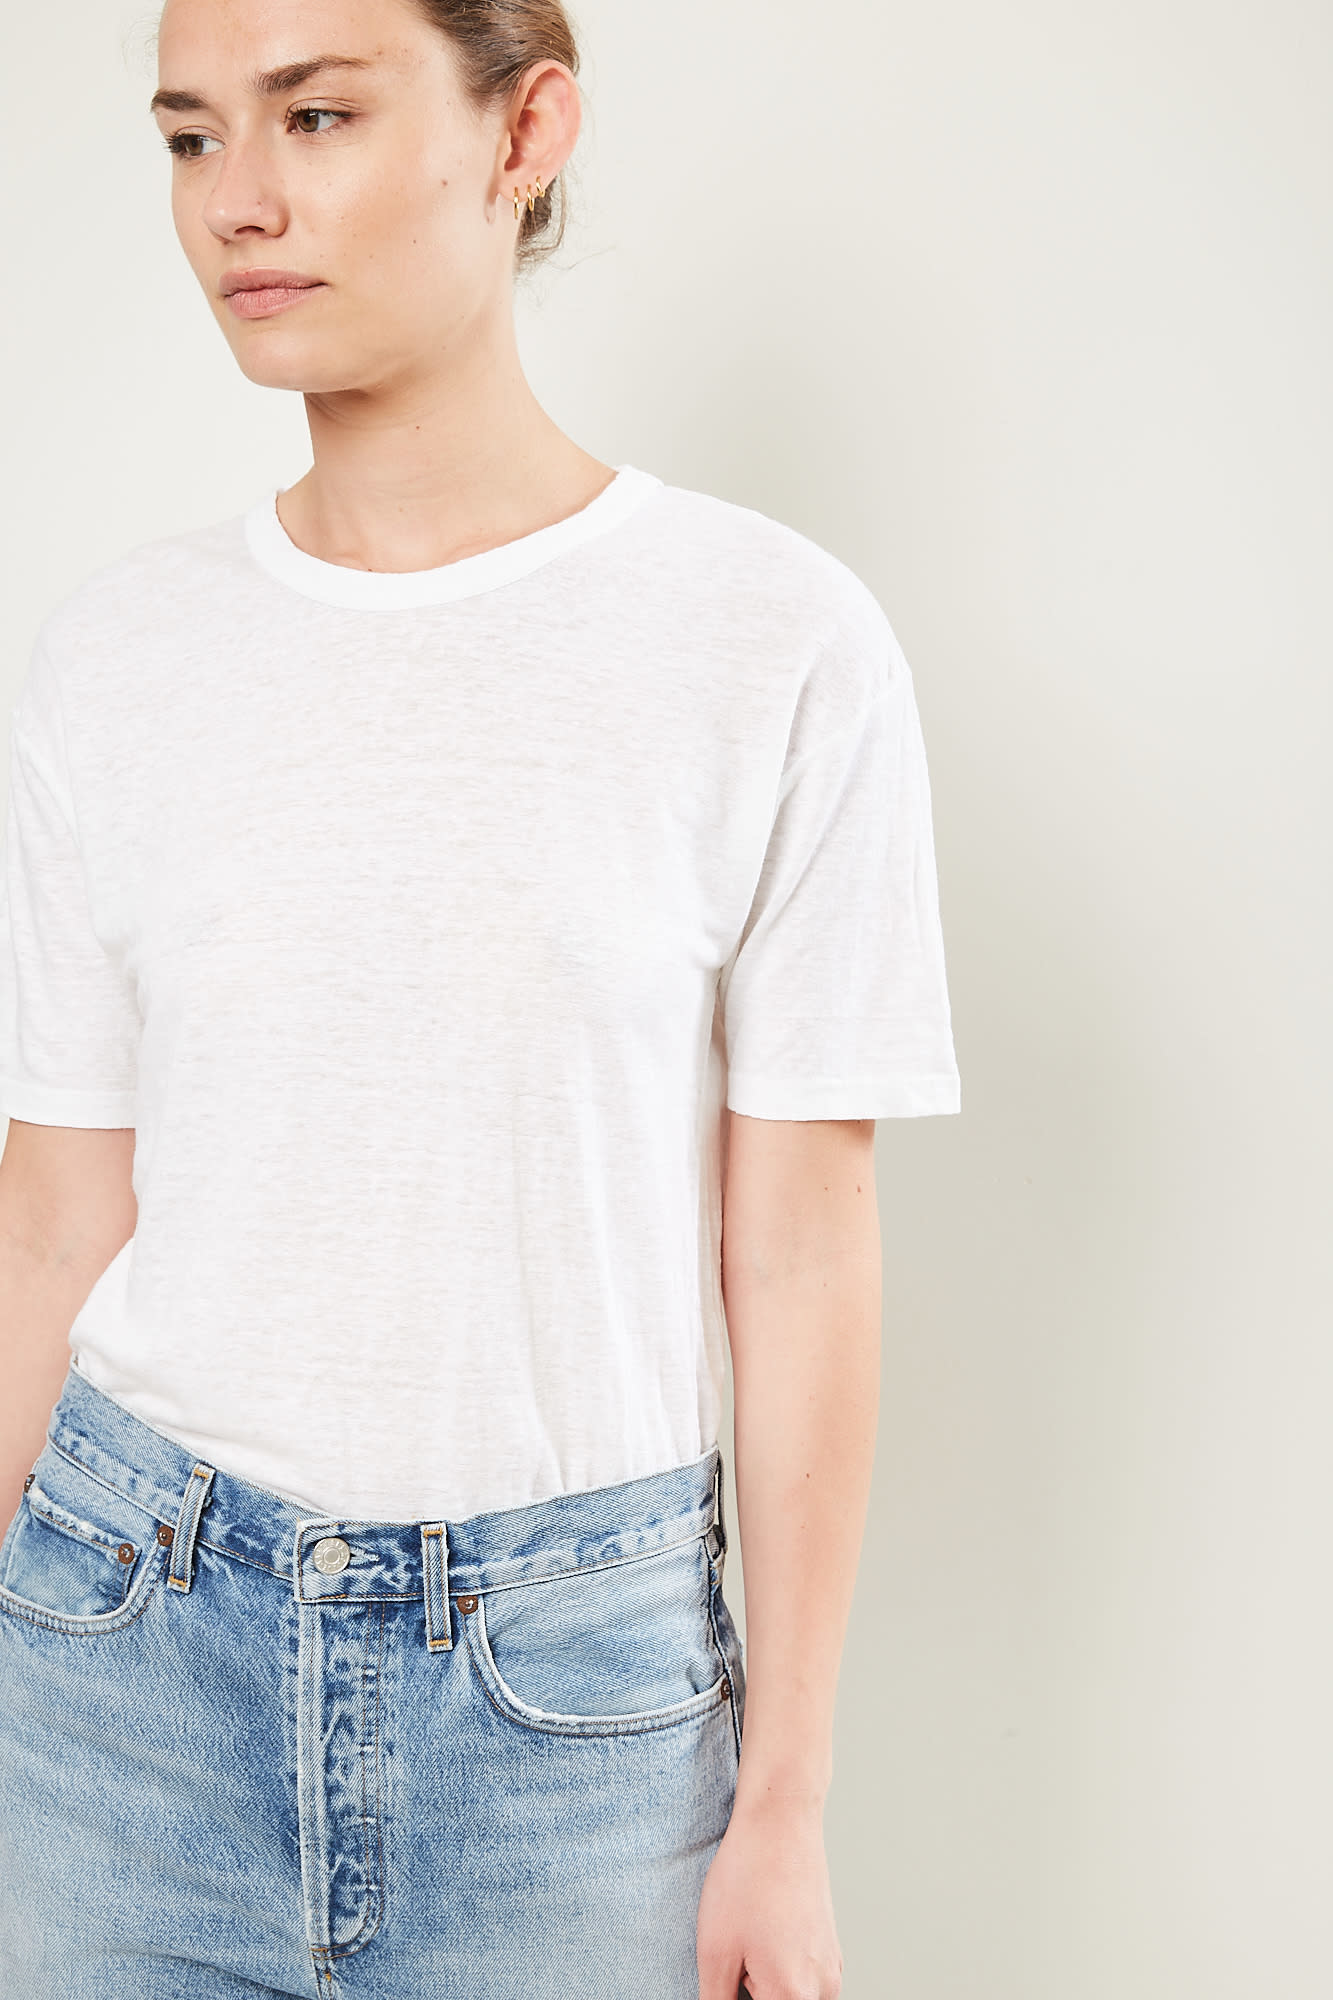 Etoile Isabel Marant keiran tee shirt 20wh white